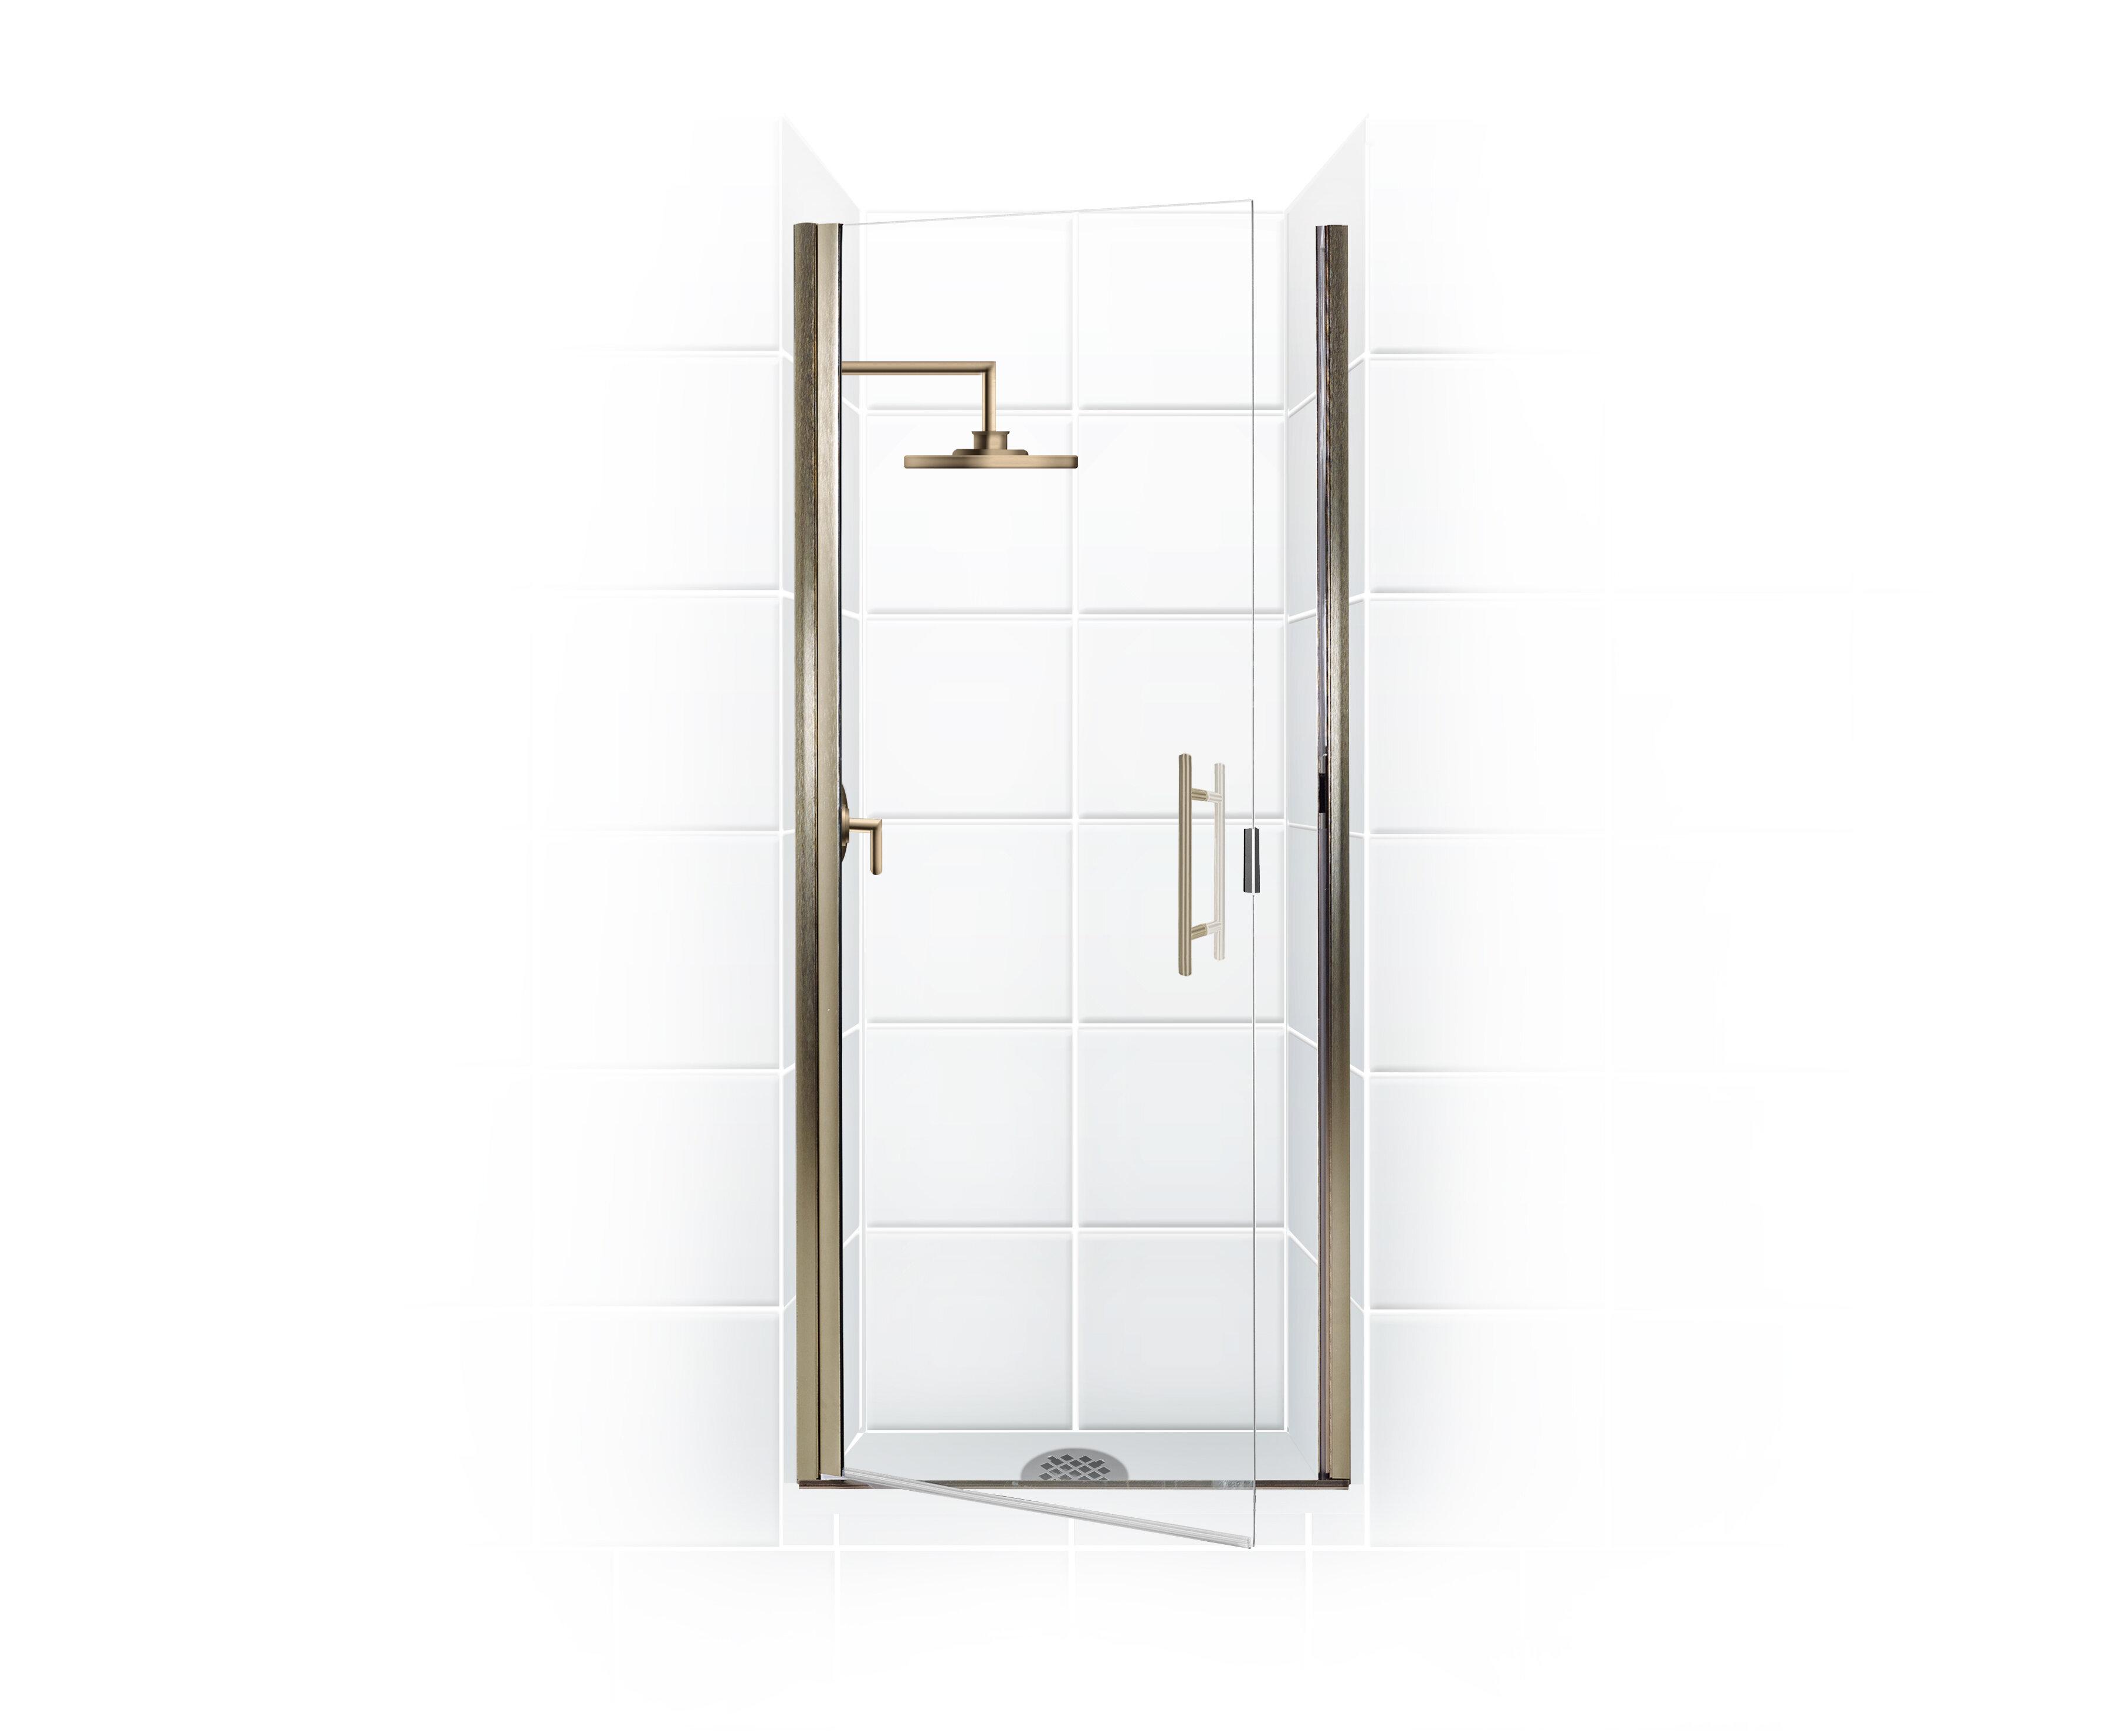 Coastal Industries Paragon Series 24 X 69 Hinged Semi Frameless Shower Door Wayfair